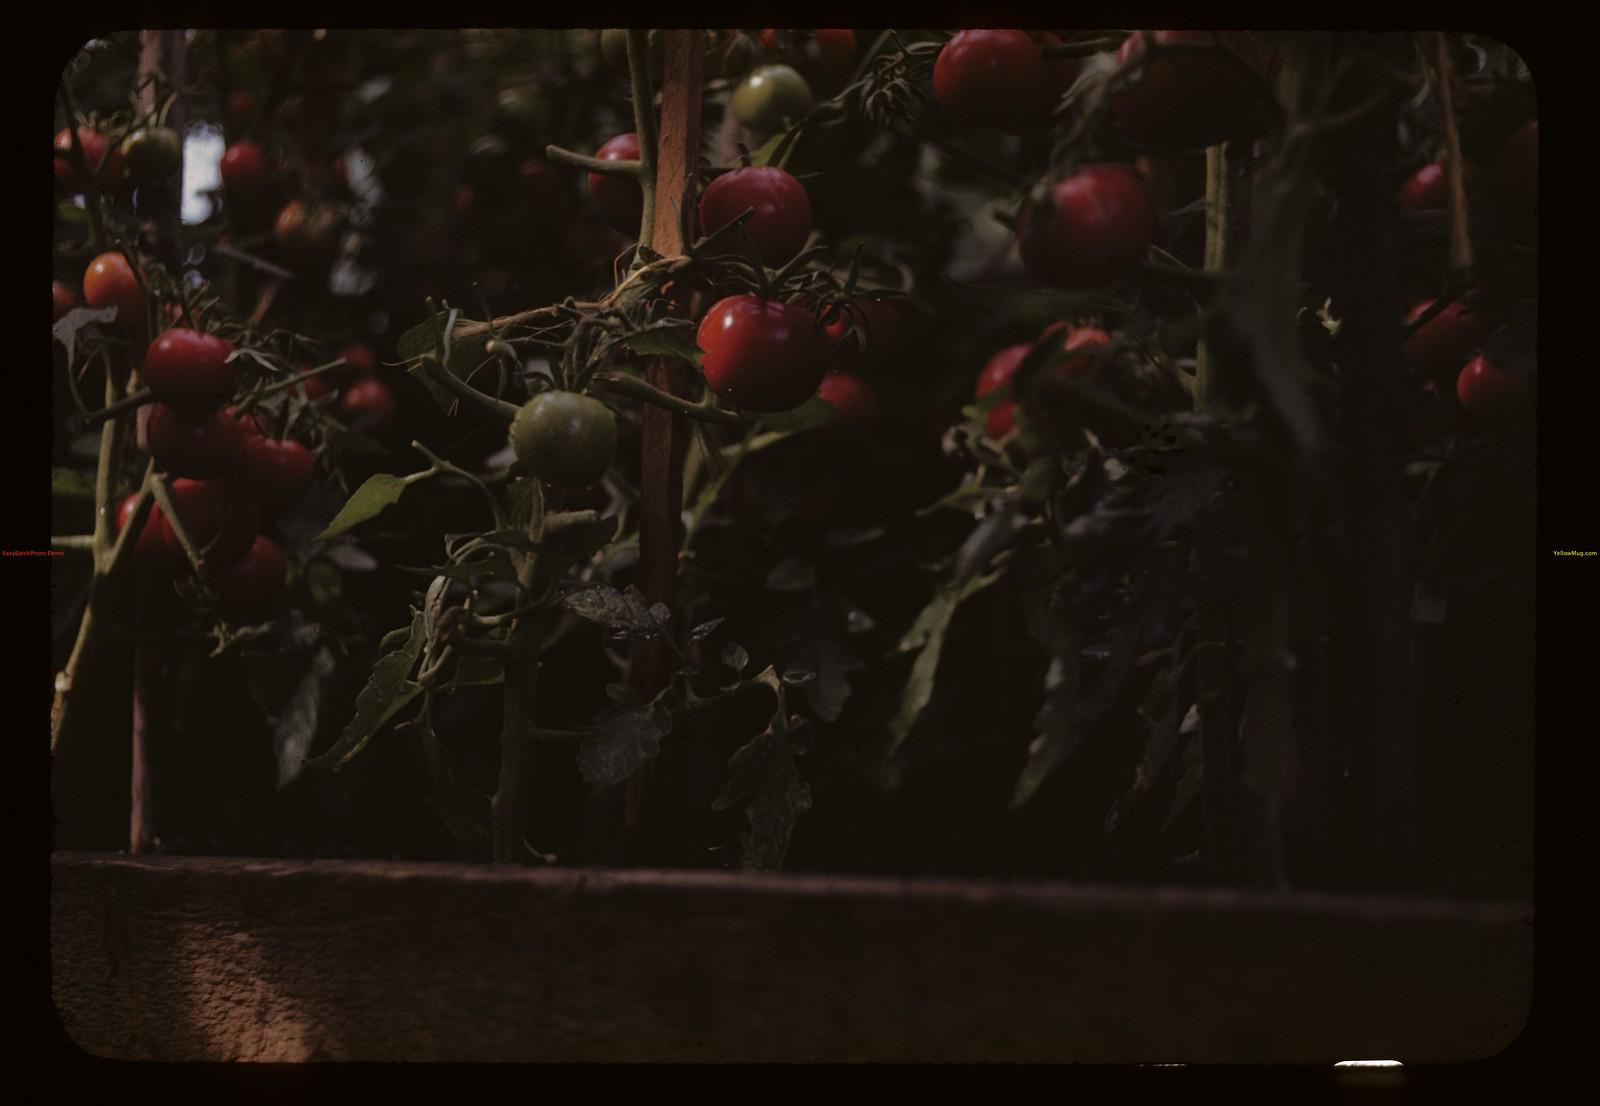 Charles Hare's greenhouse tomatoes. Bapaume 07/30/1944